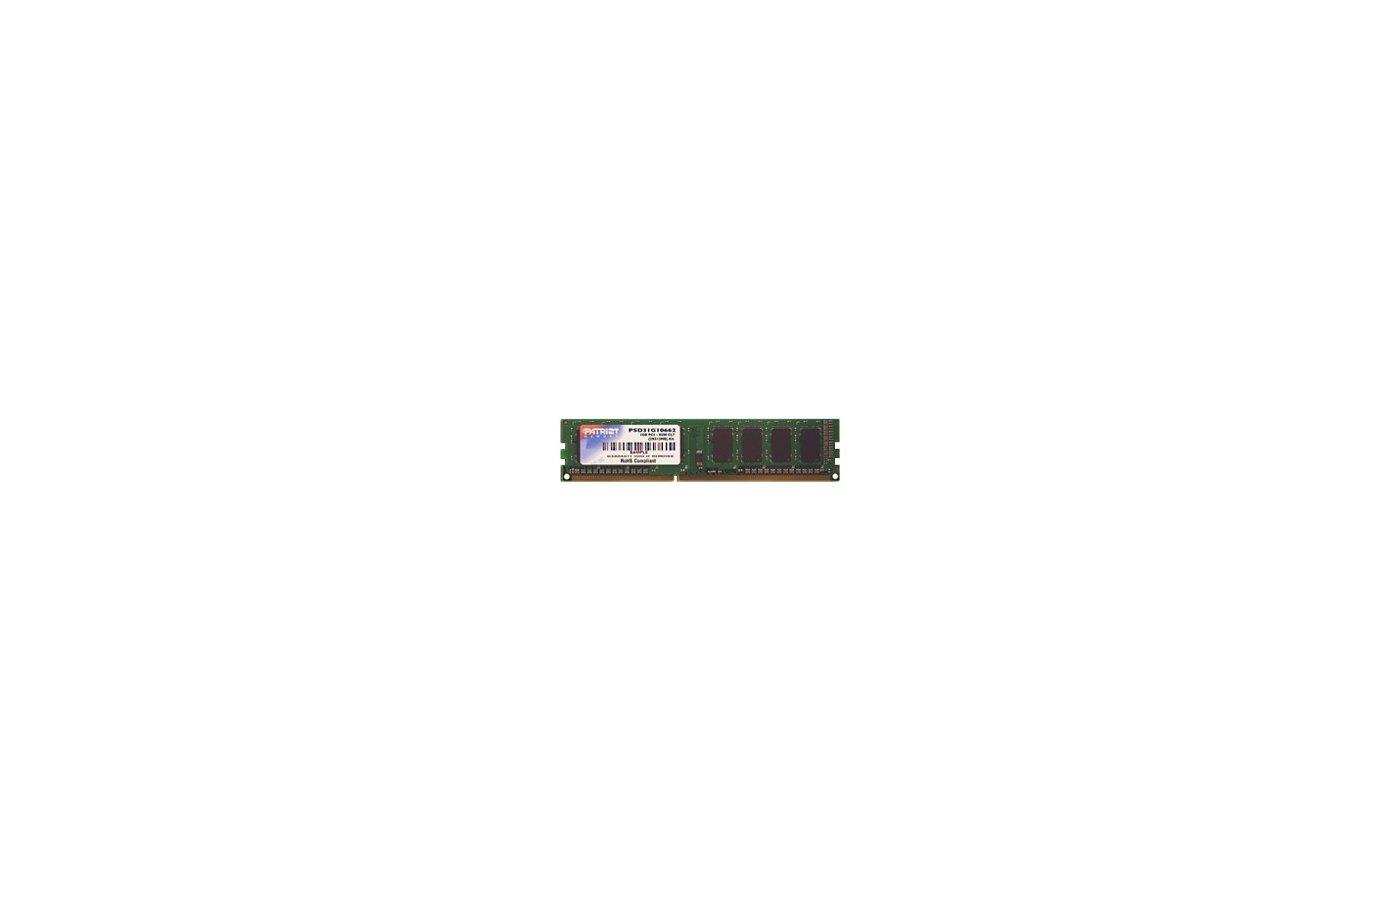 Оперативная память Patriot PSD31G133381 RTL PC3-10600 DDR3 1Gb 1333MHz